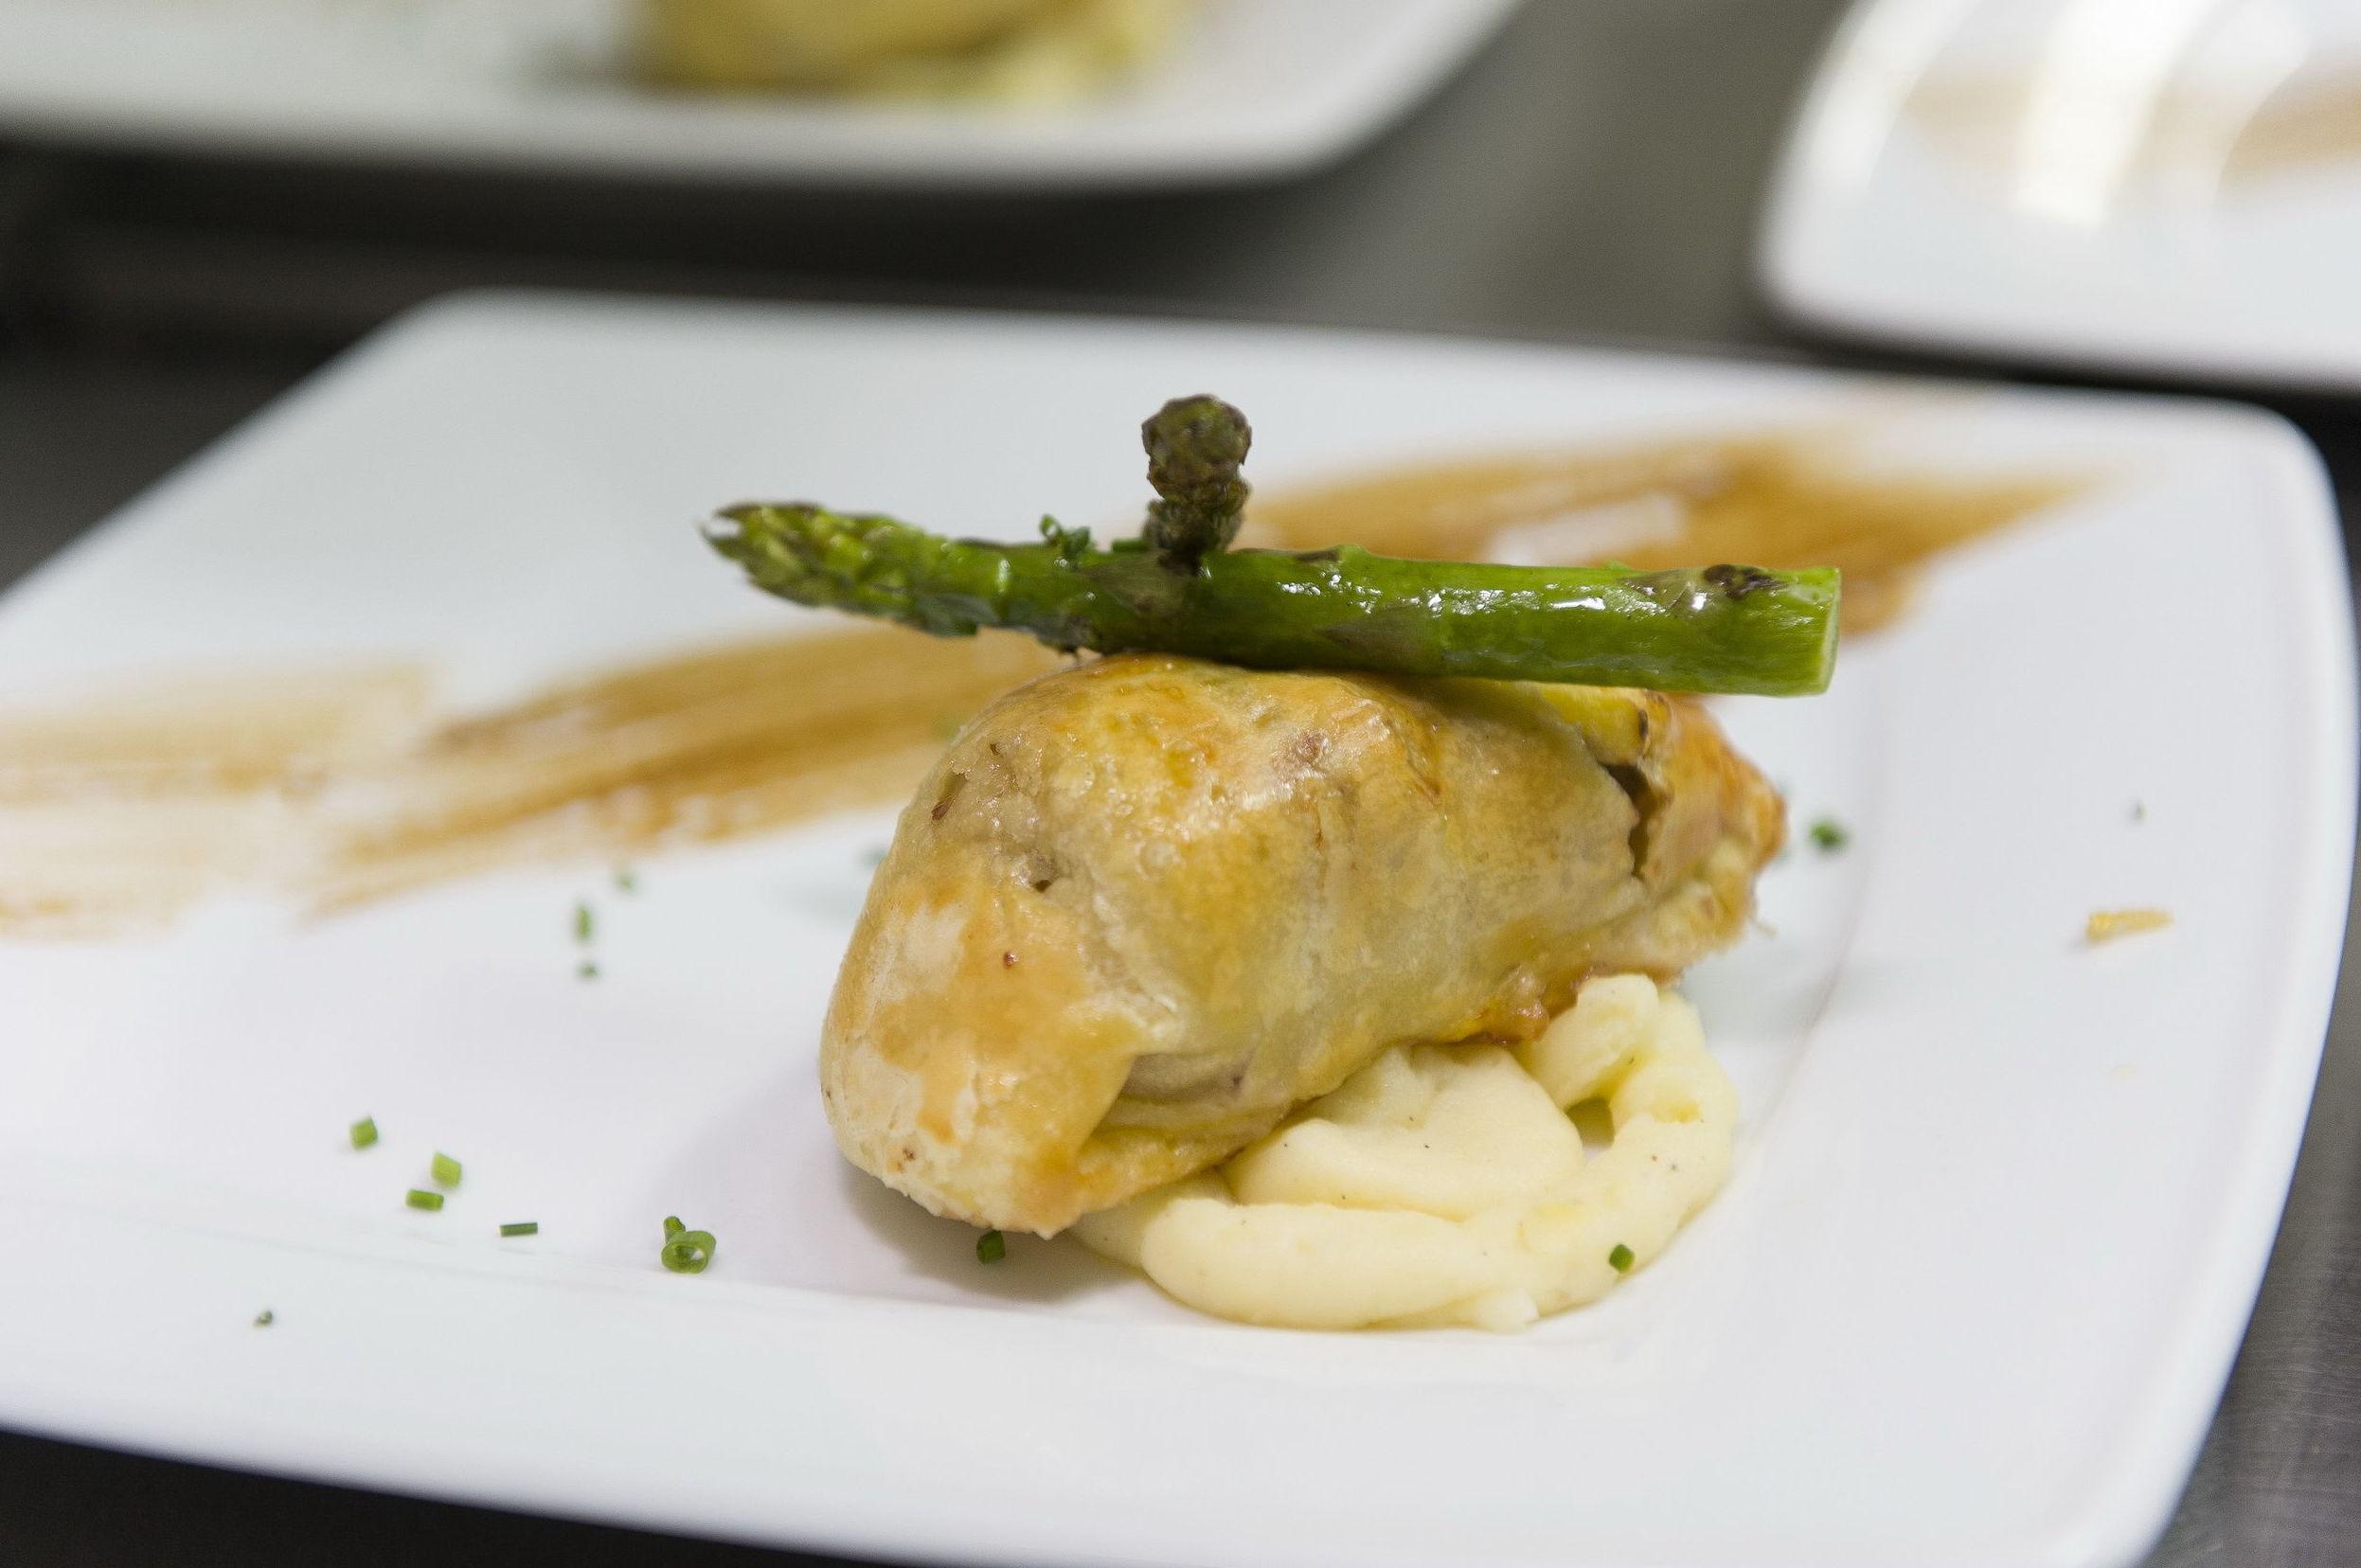 Cocina tradicional\u002Dclásica mediterránea